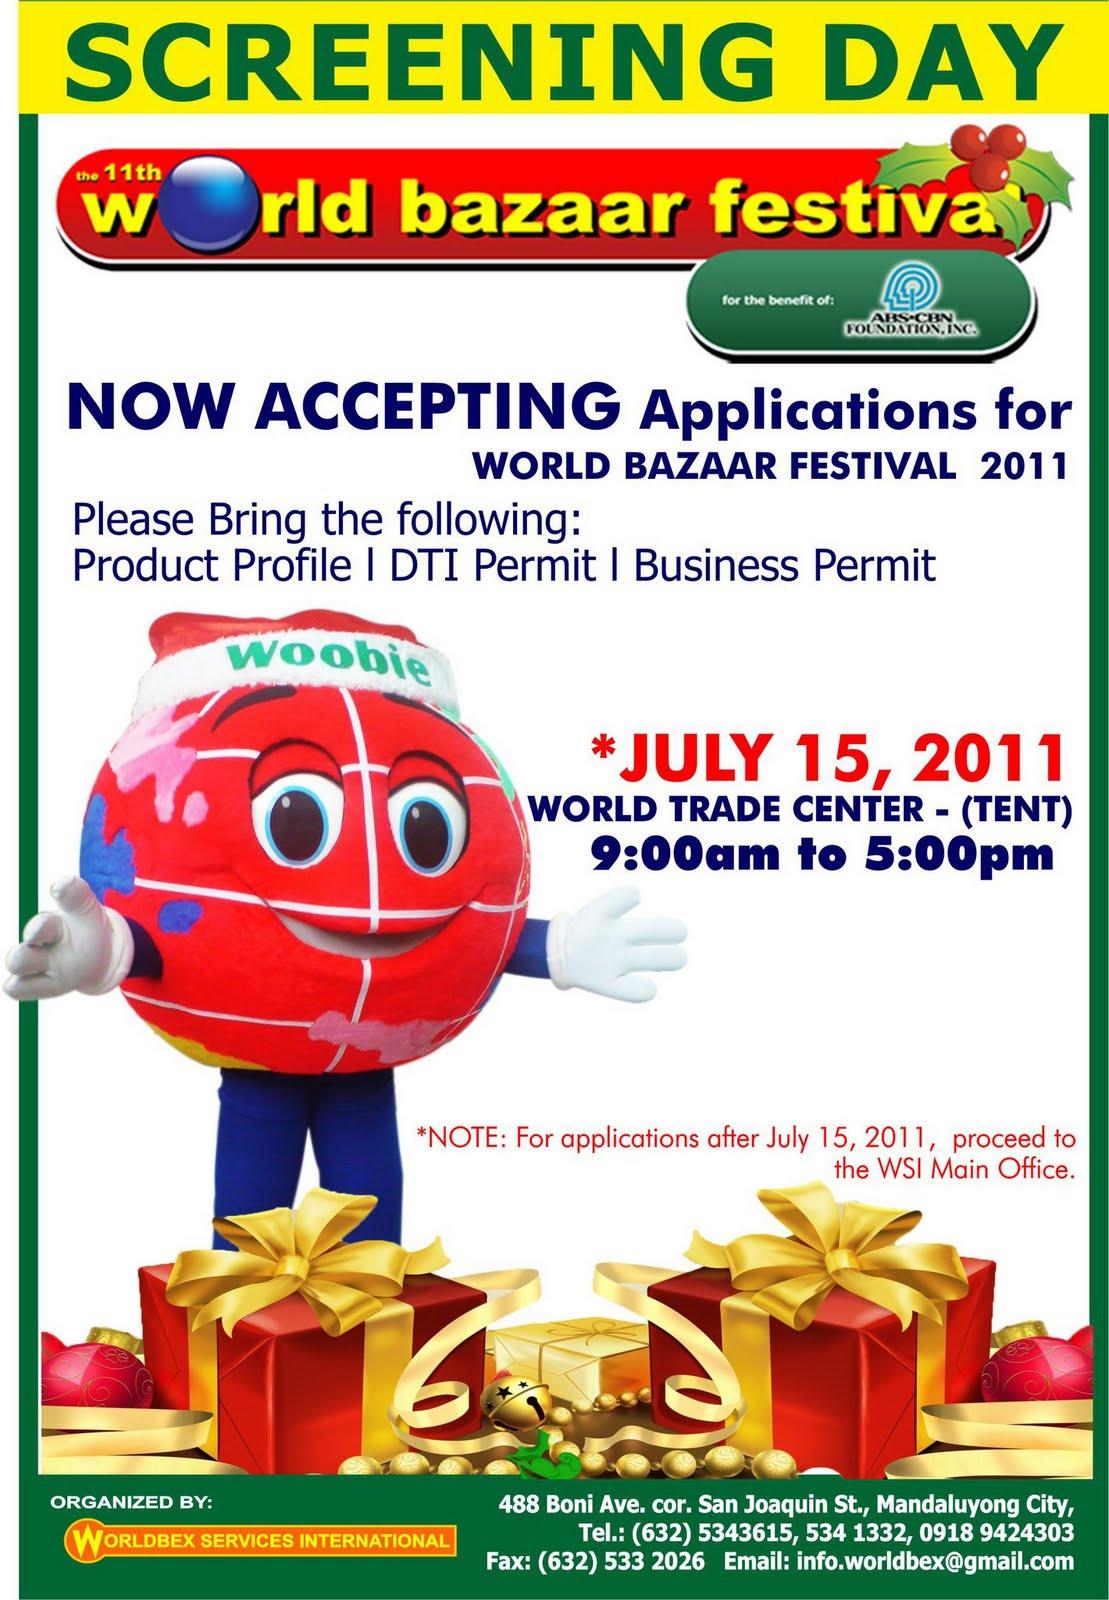 Fashion Distributor Wholesalesarong Com Announces New: Manila Life: THE 11TH WORLD BAZAAR FESTIVAL ANNOUNCES